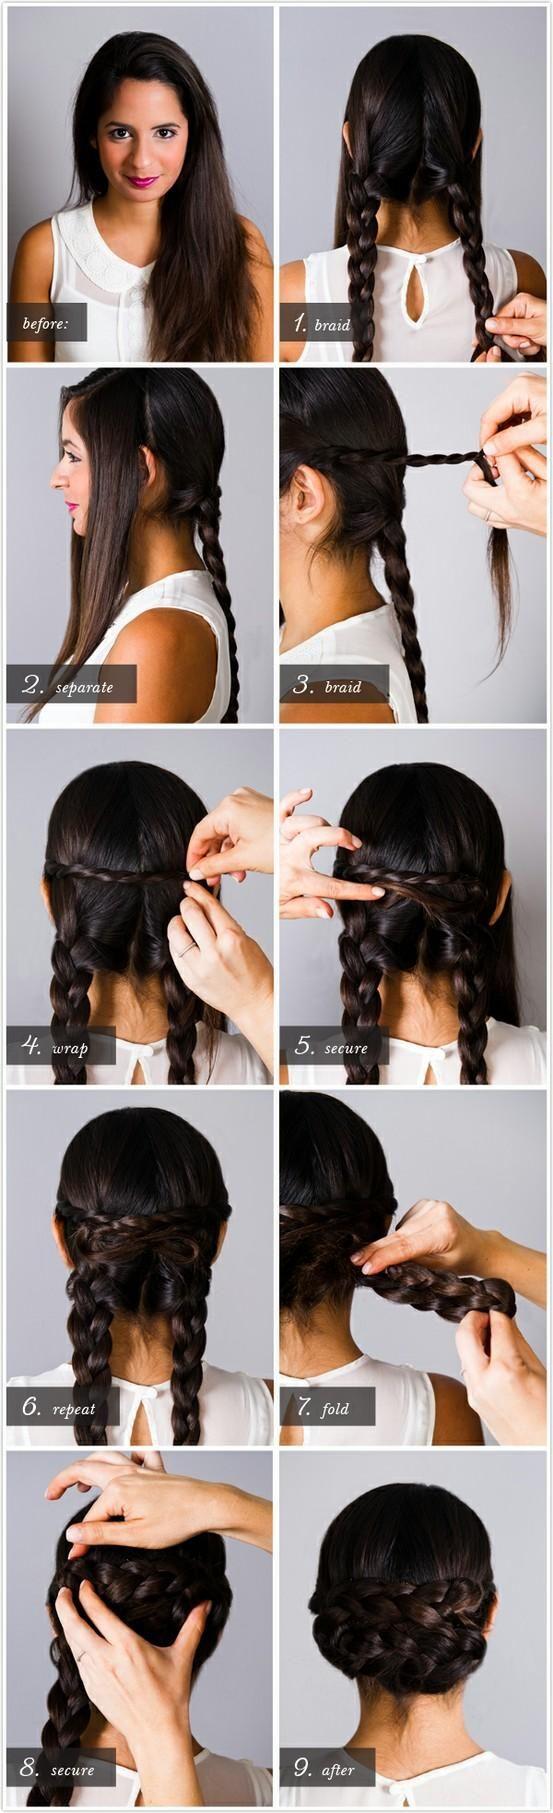 Braided Chignon Tutorial | Hair and Beauty Tutorials